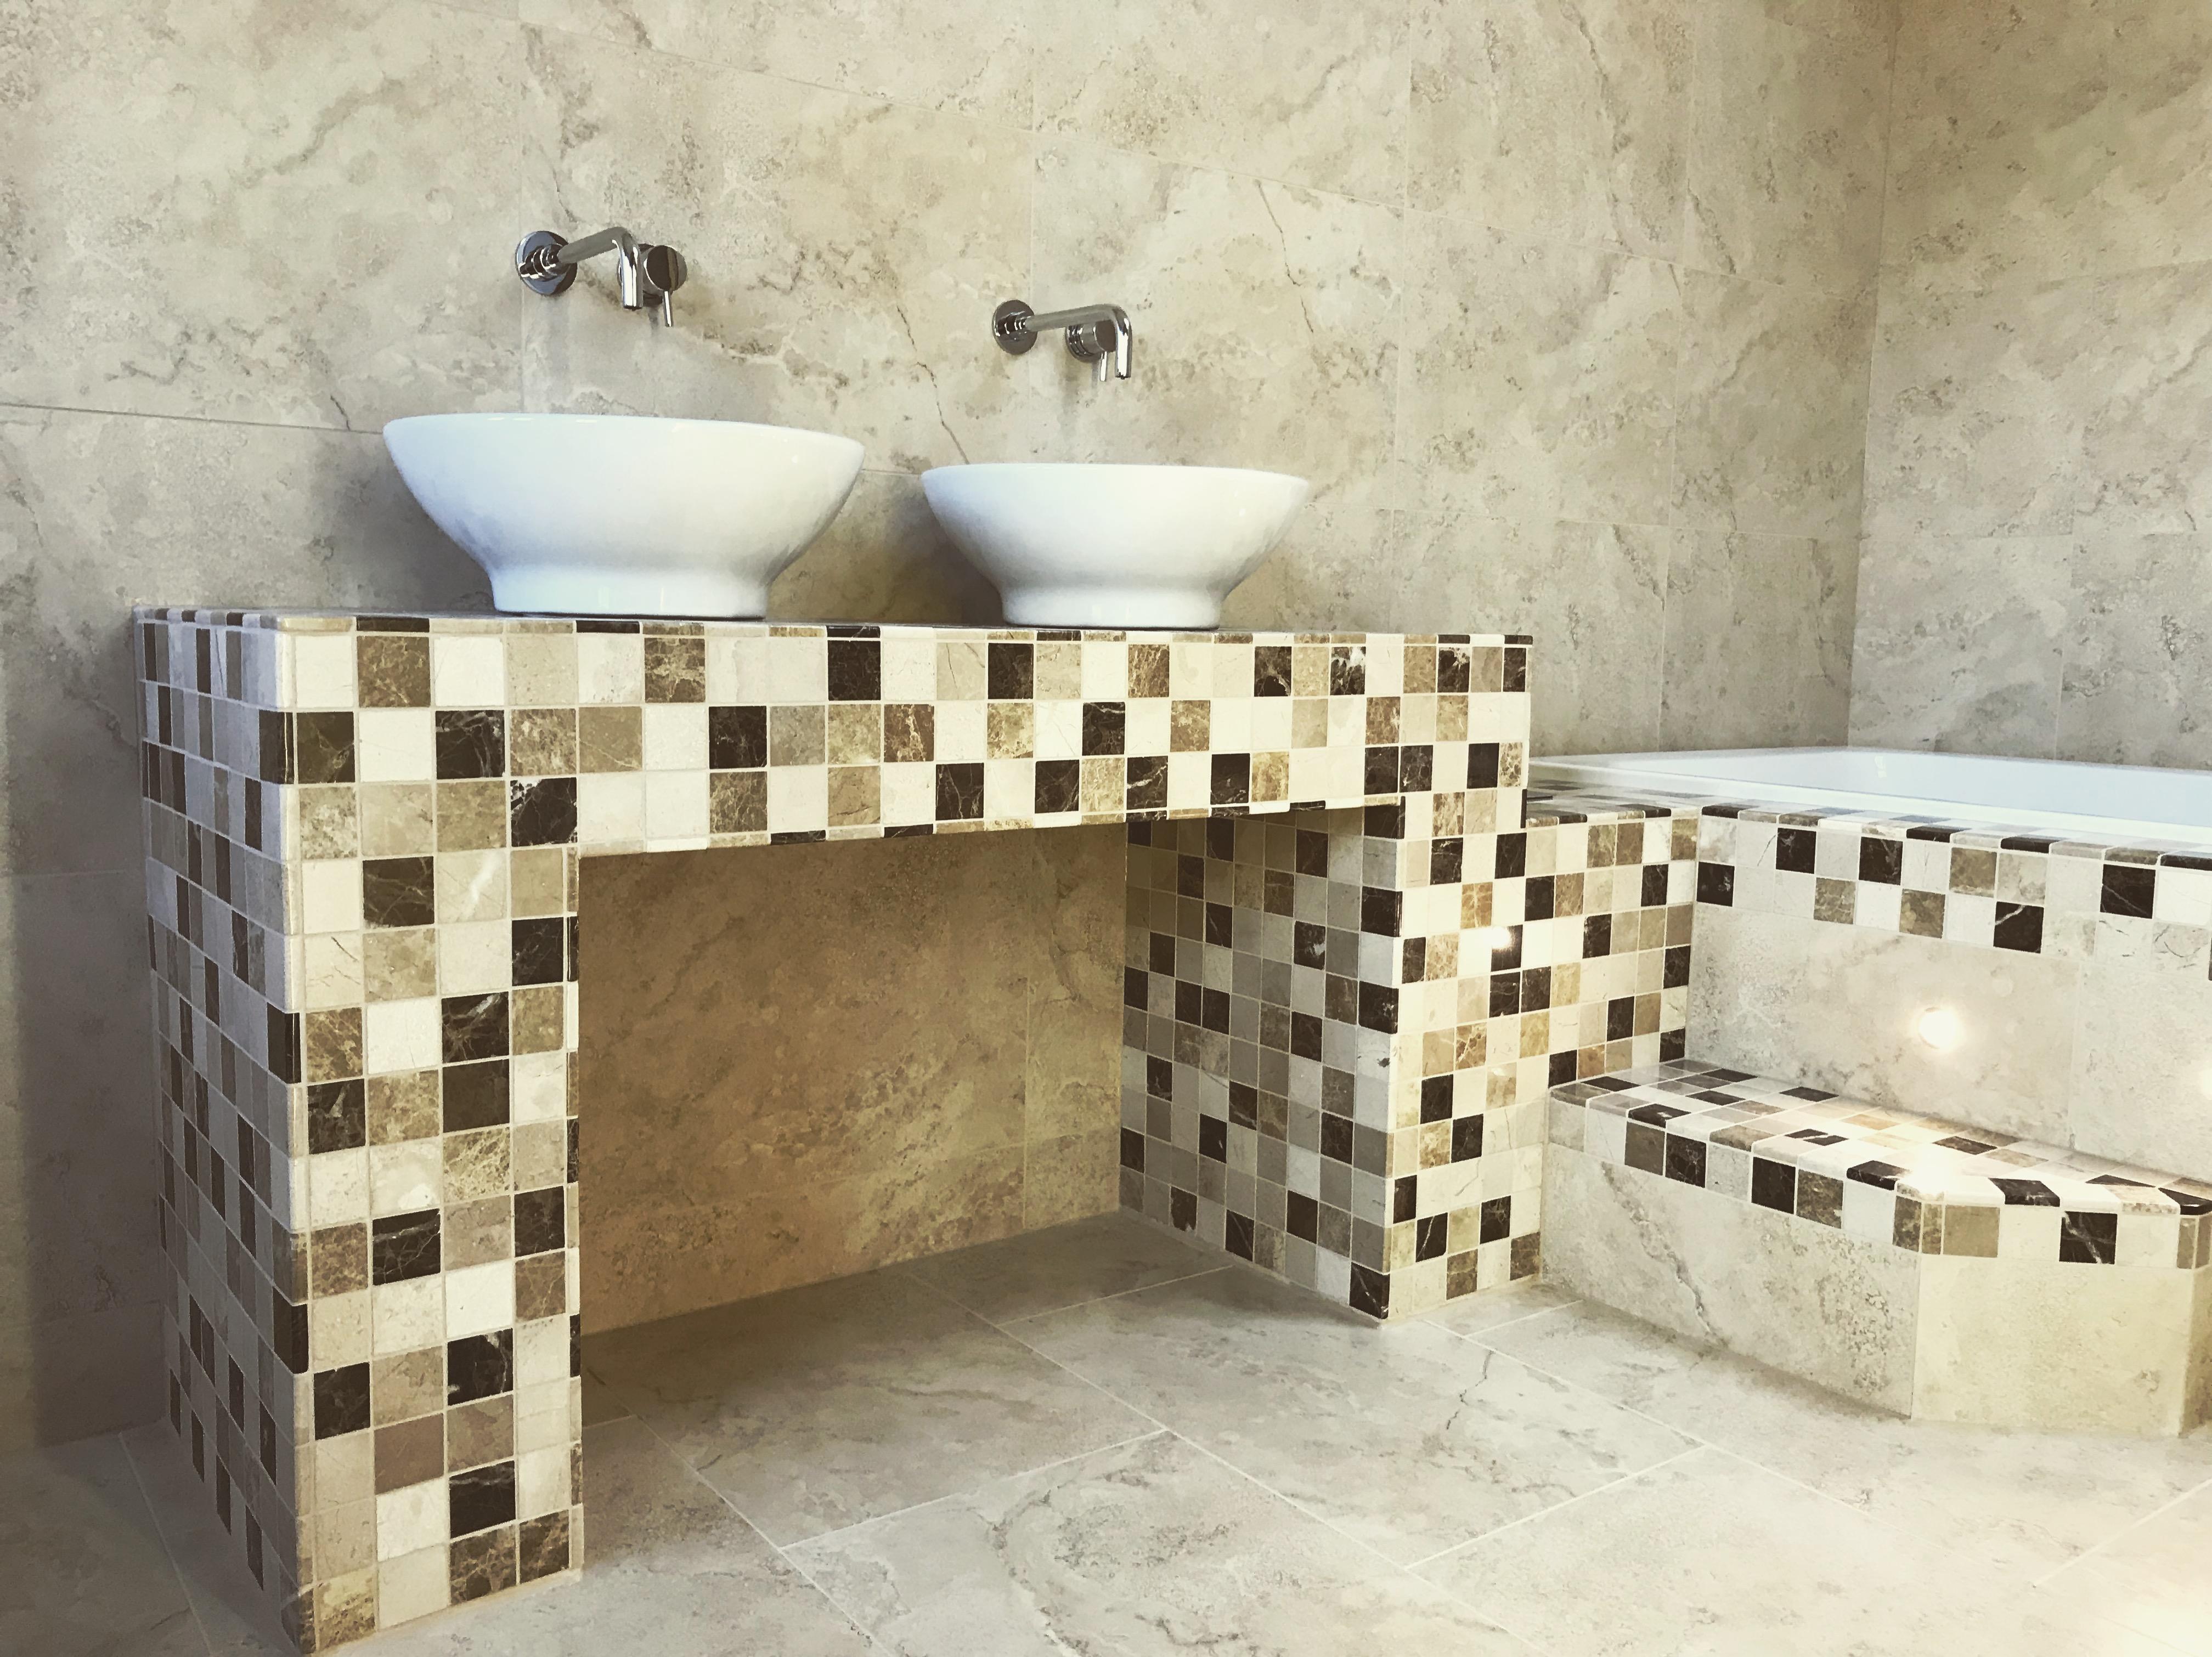 Stone mosaic bathroom table and step